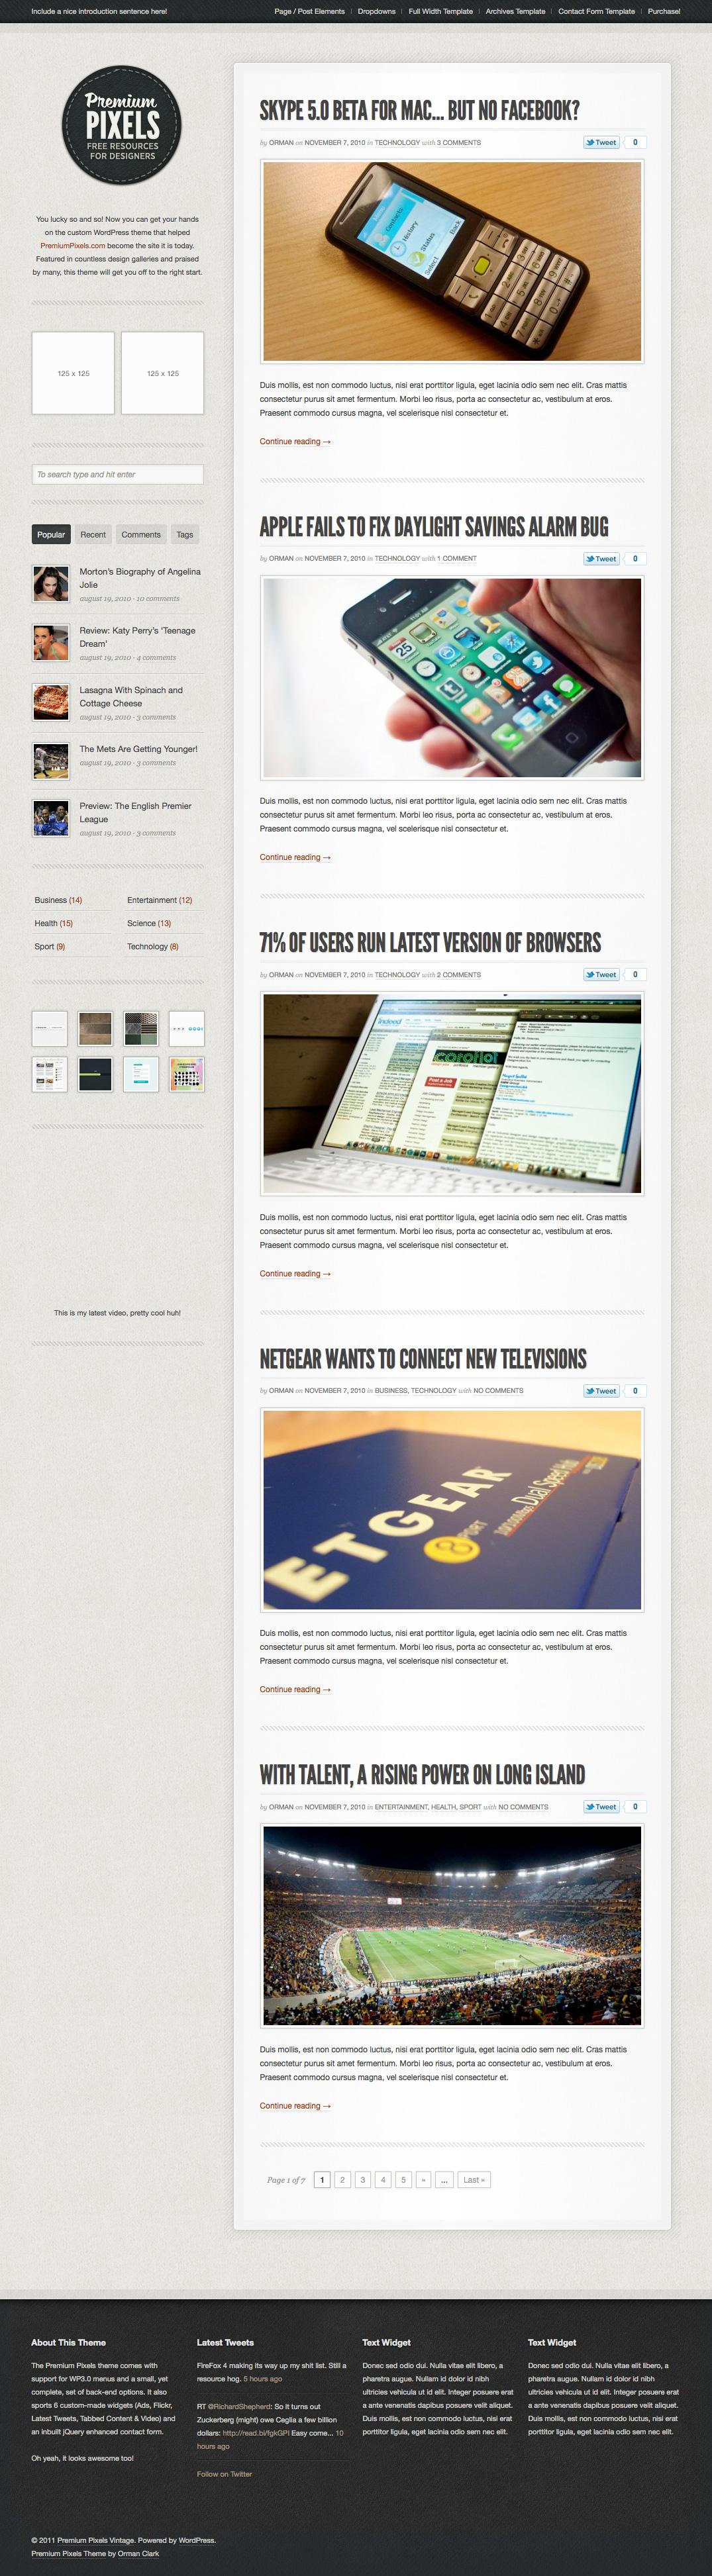 Premium Pixels WordPress Theme by ormanclark